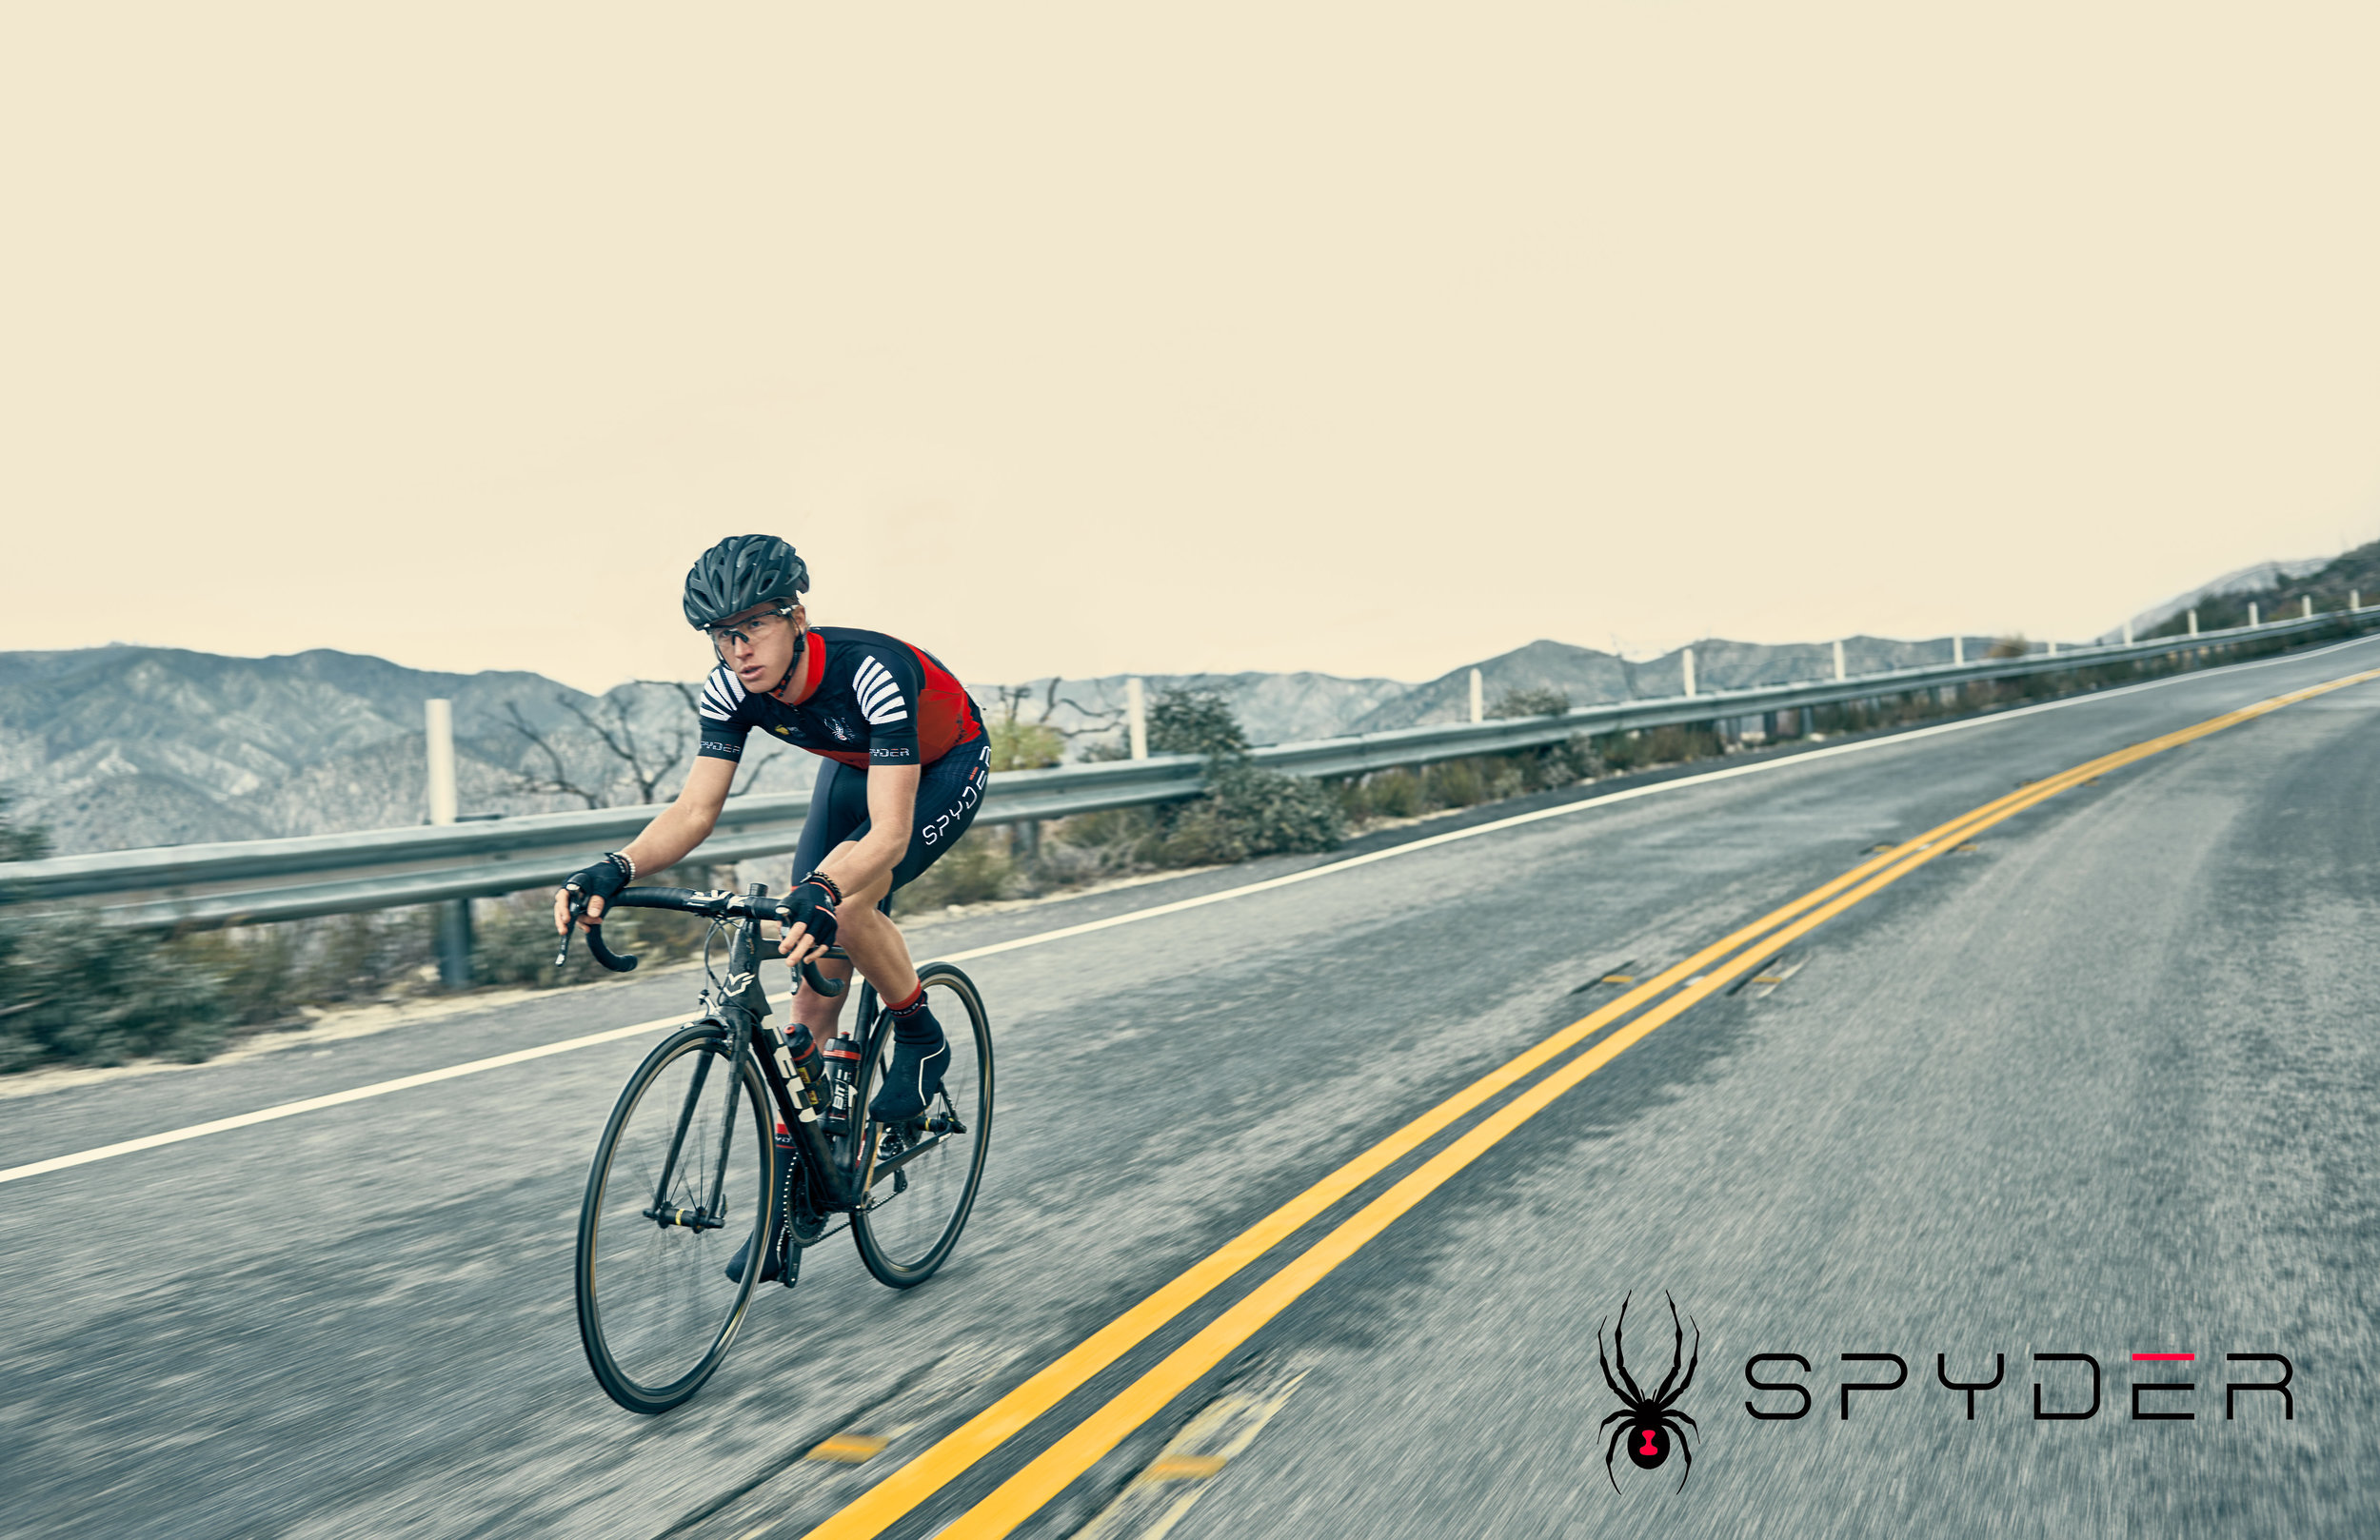 Spyder Sports - Branding Campaign